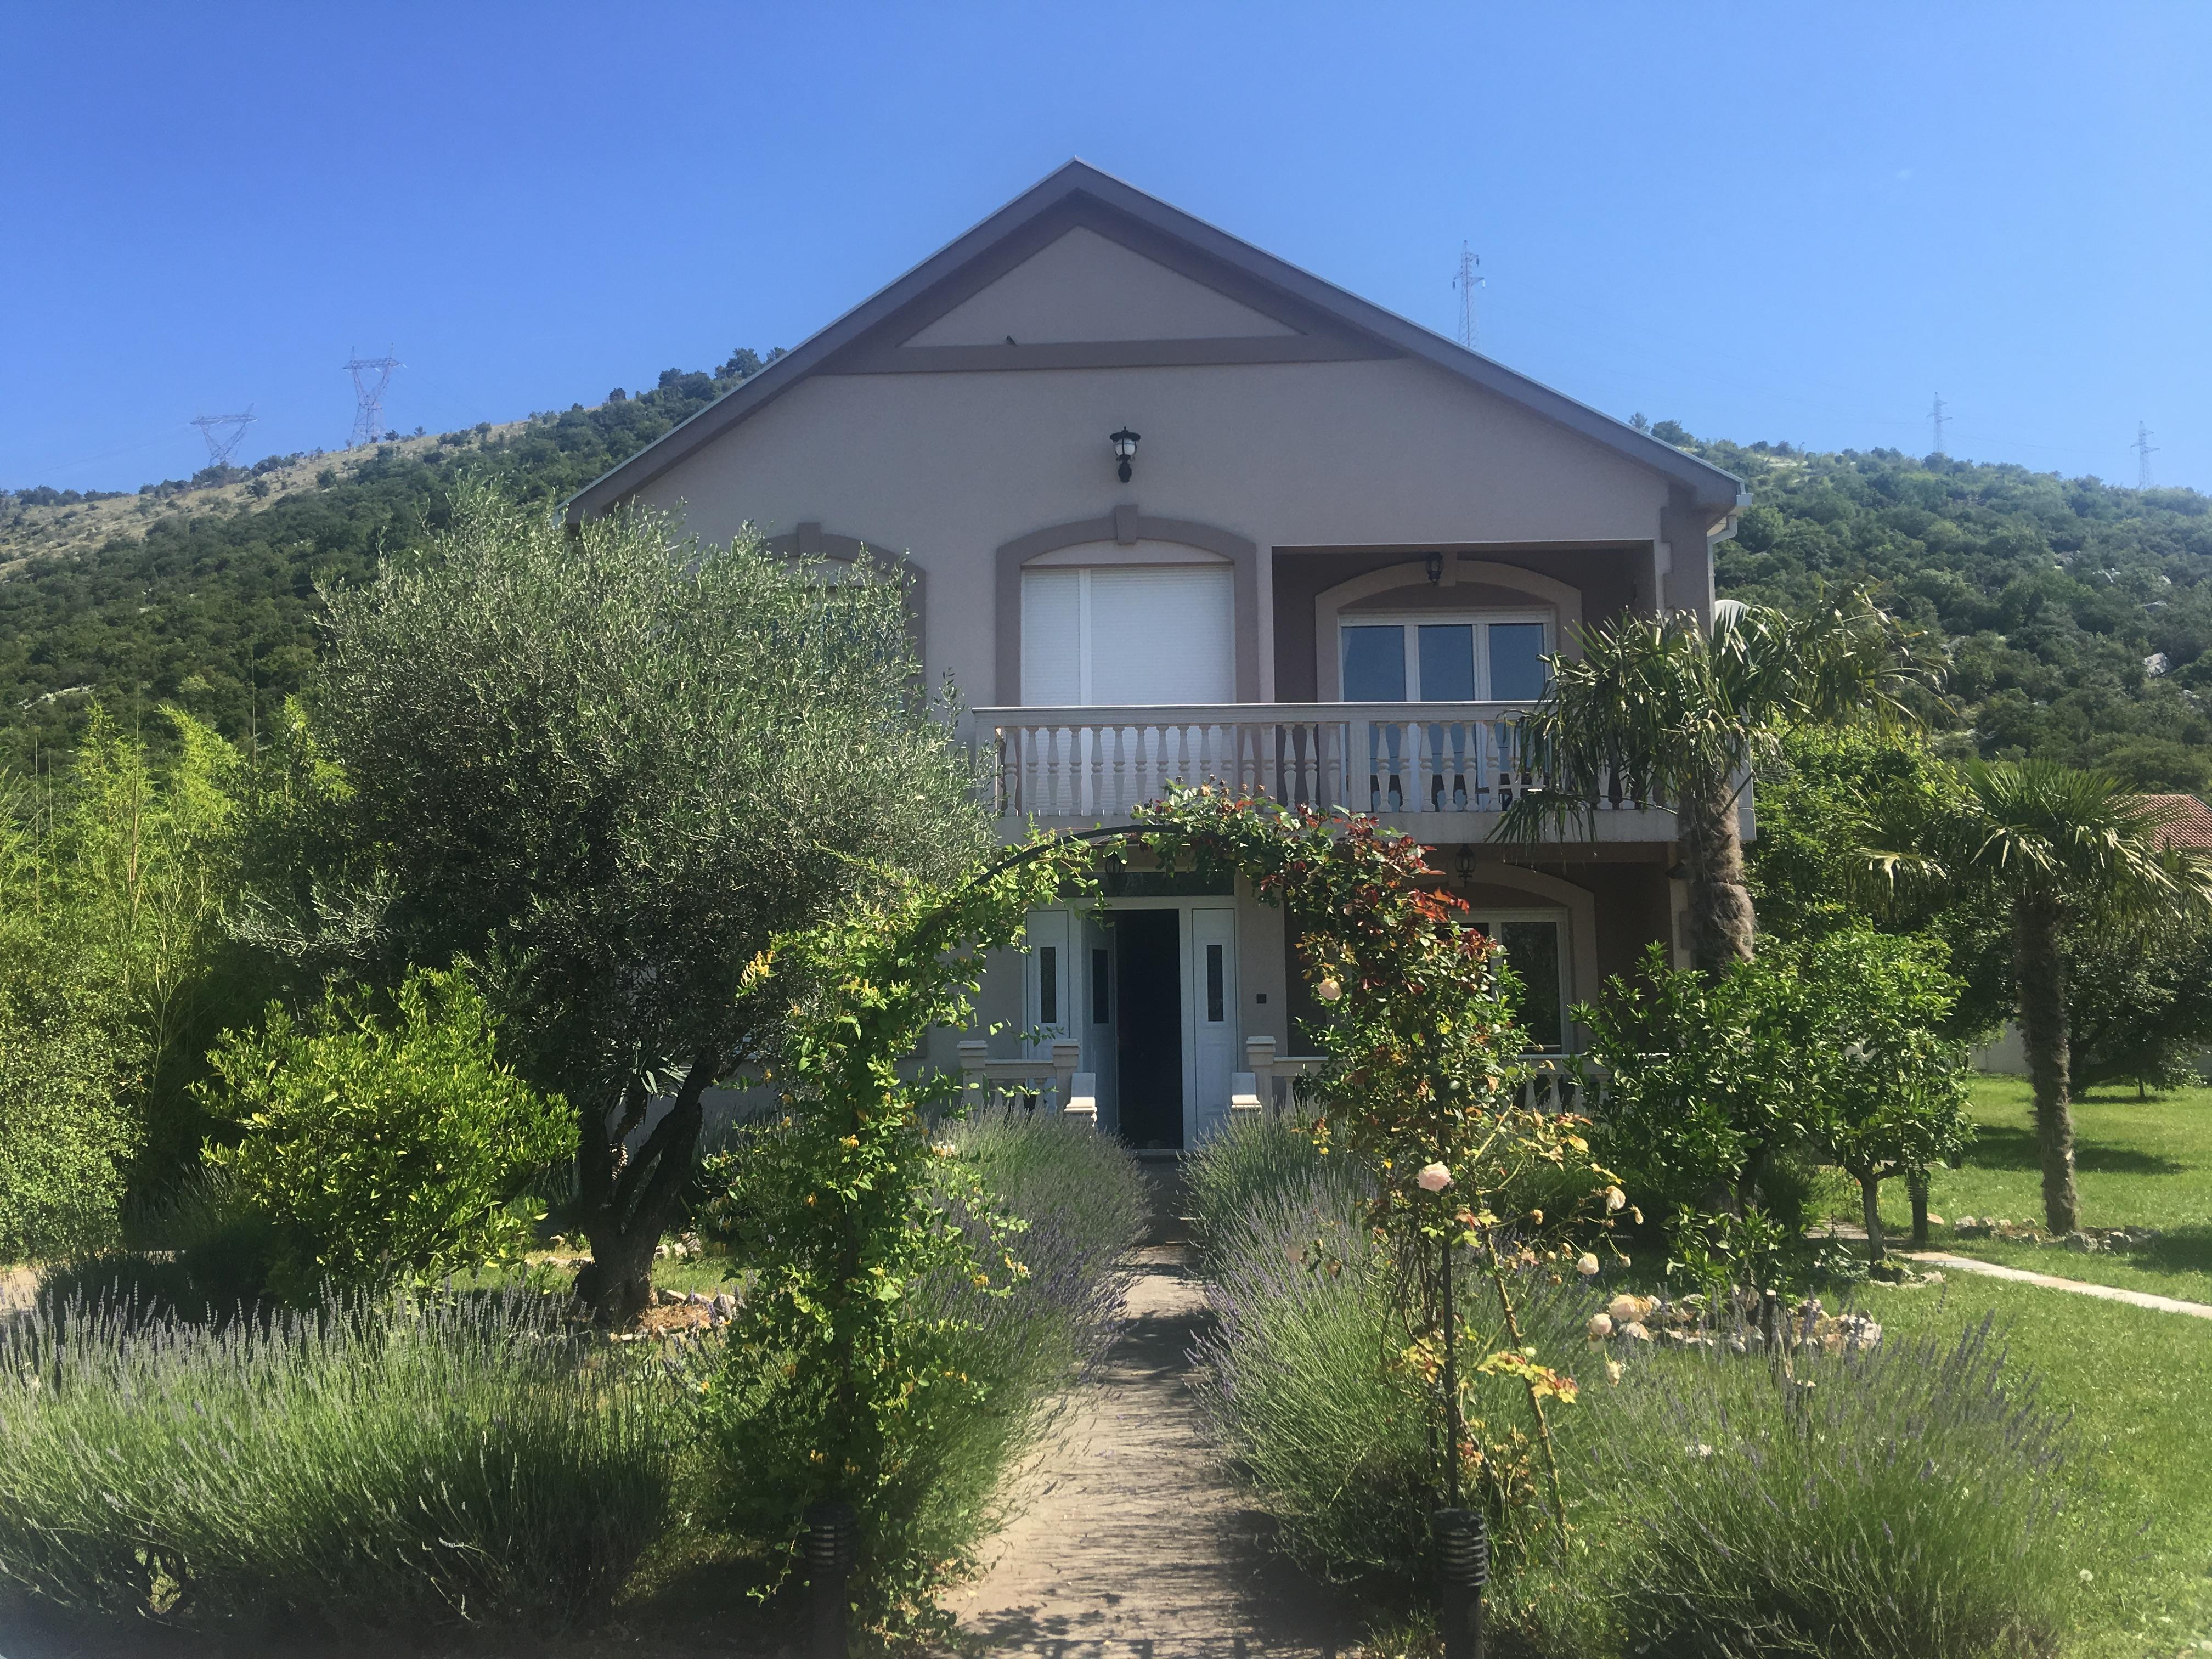 Vente maison ind pendante podgorica podgorica montenegro partizanski put - Maison independante energetiquement ...